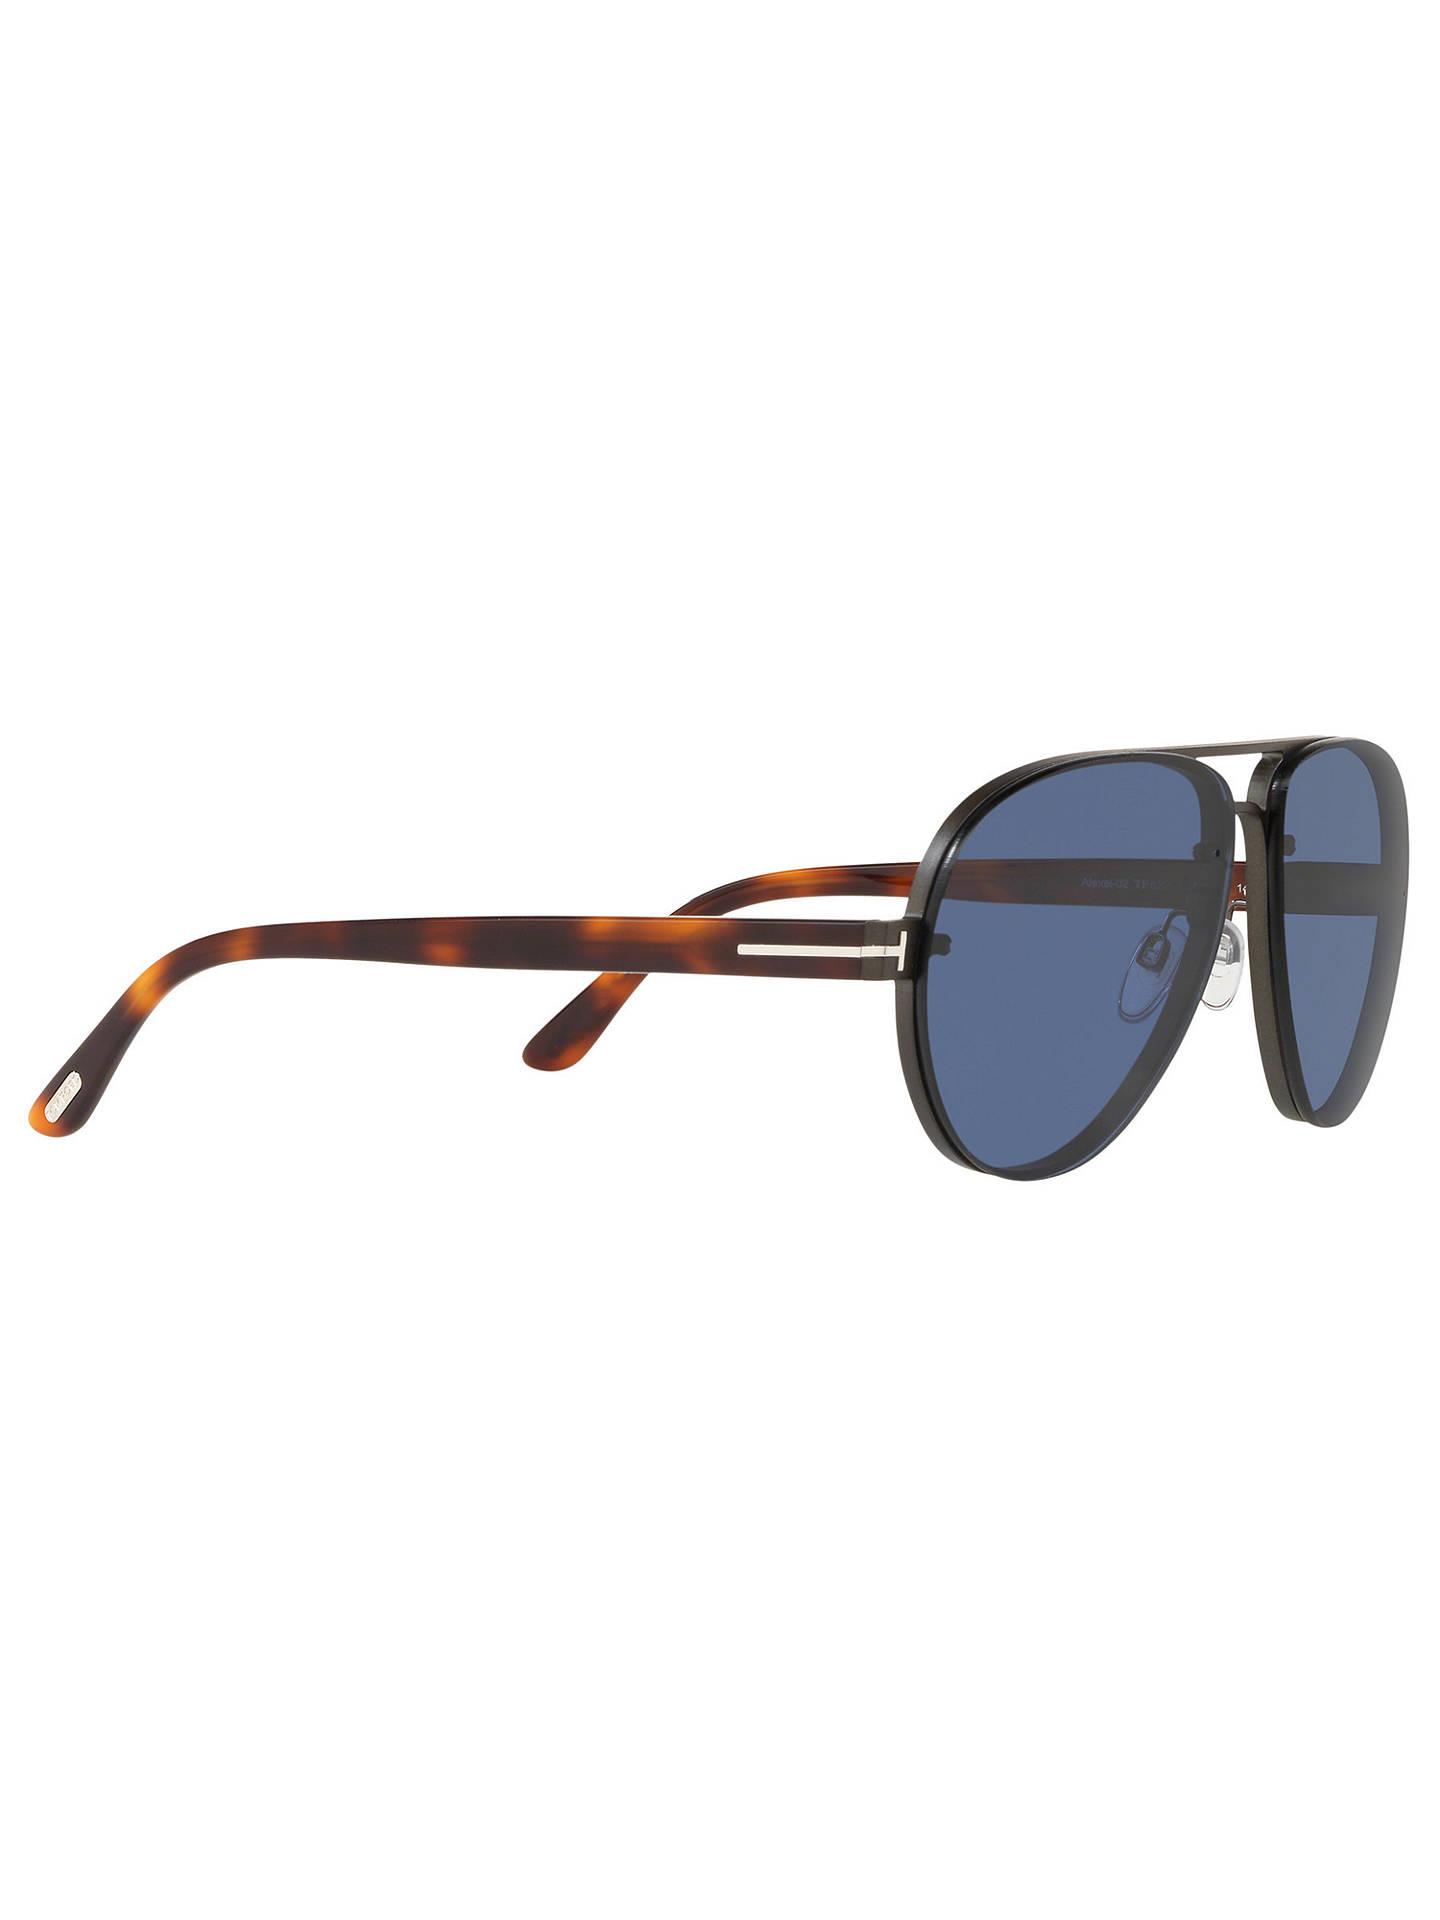 e512eeb697b71 TOM FORD FT0622 Men s Alexei-02 Aviator Sunglasses at John Lewis ...